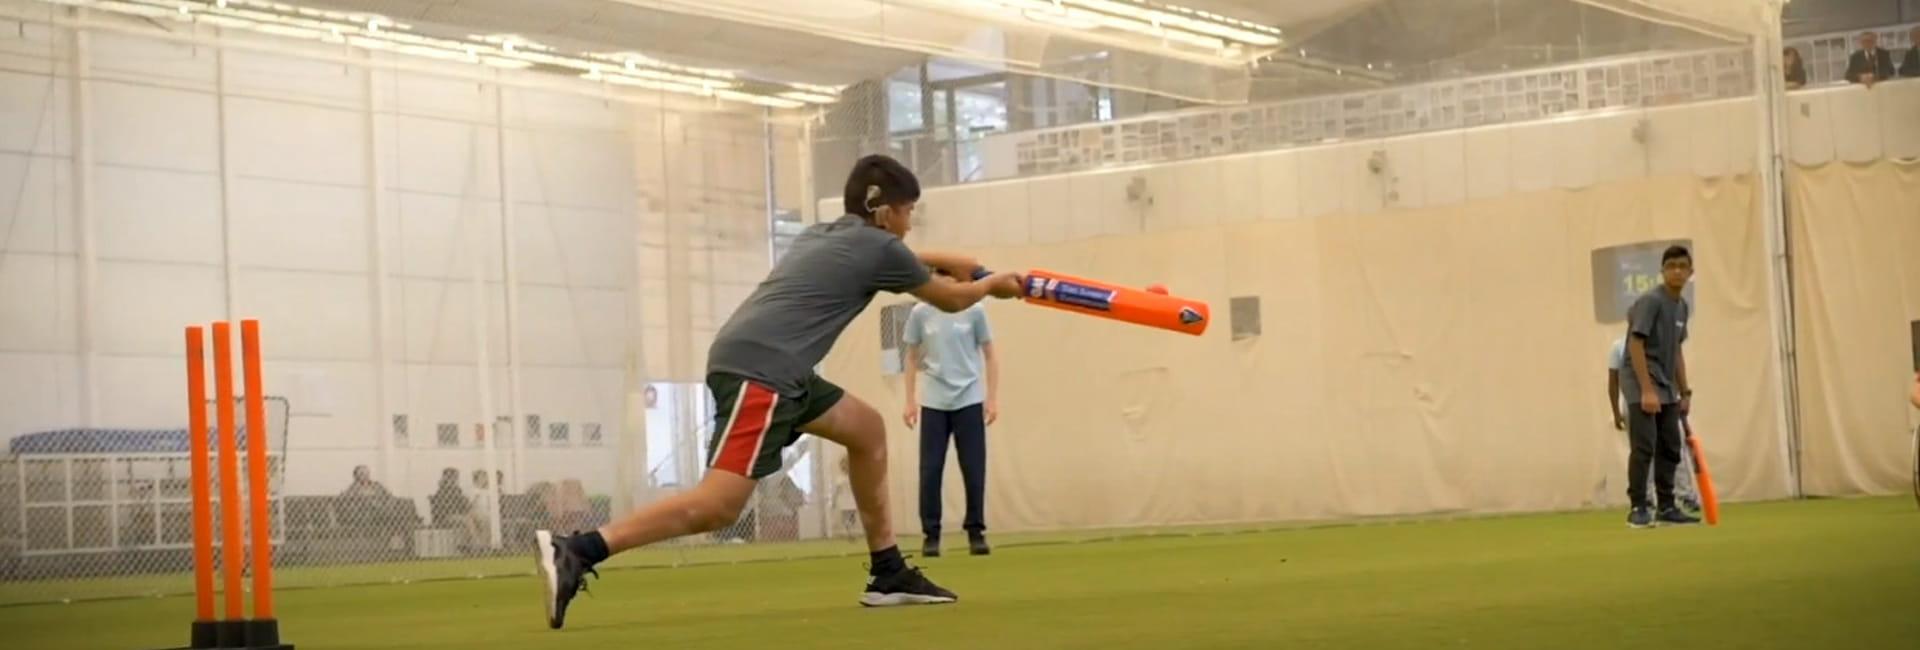 Super 1s Cricket Young Children